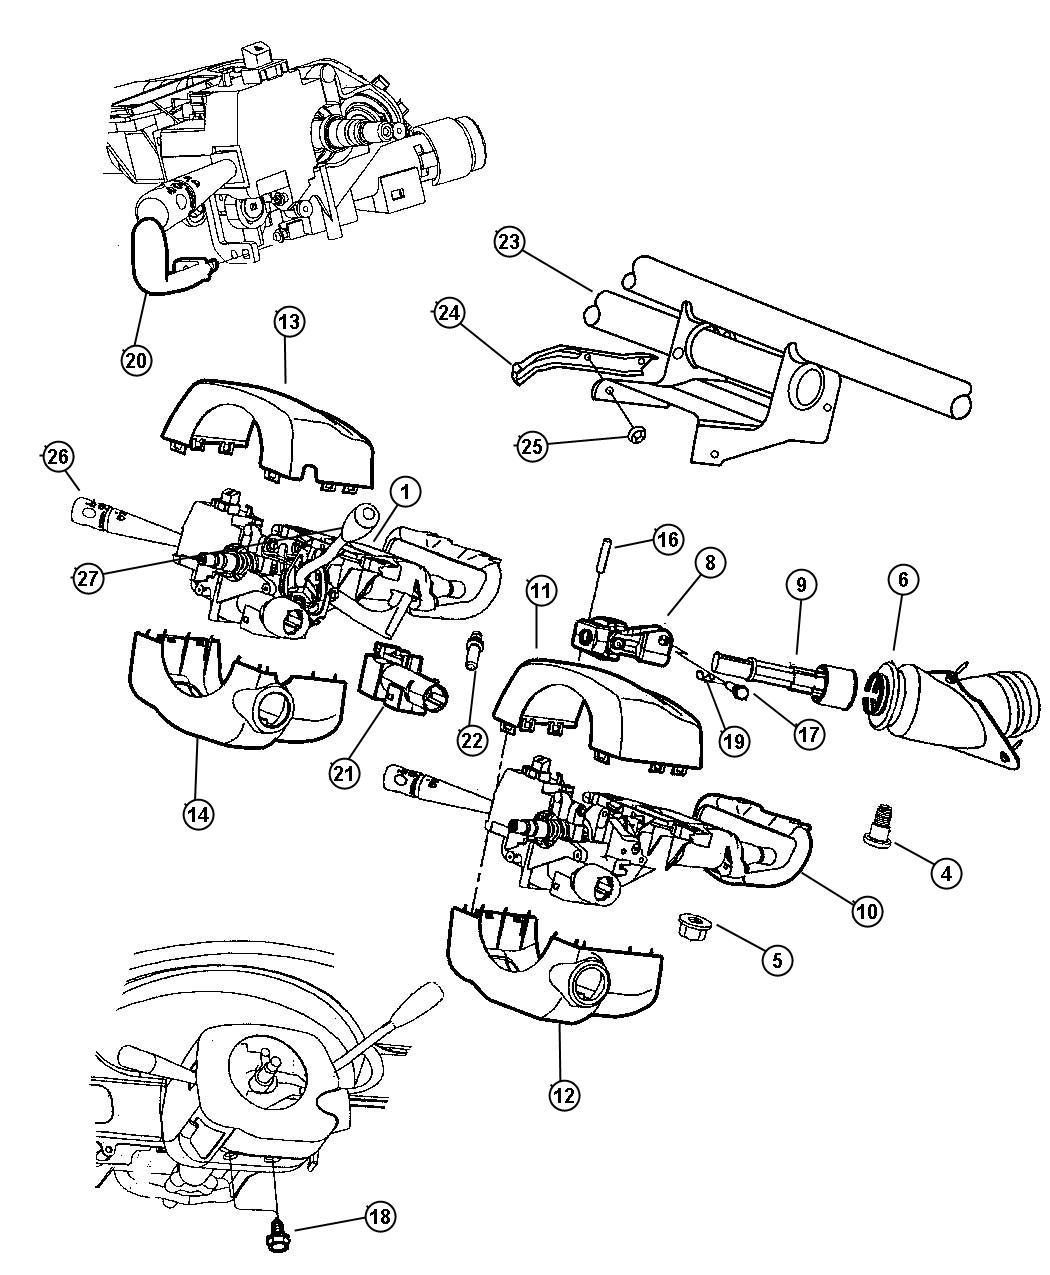 Chrysler Lhs Pin Spring M8 4x30x1 60 Export Steering